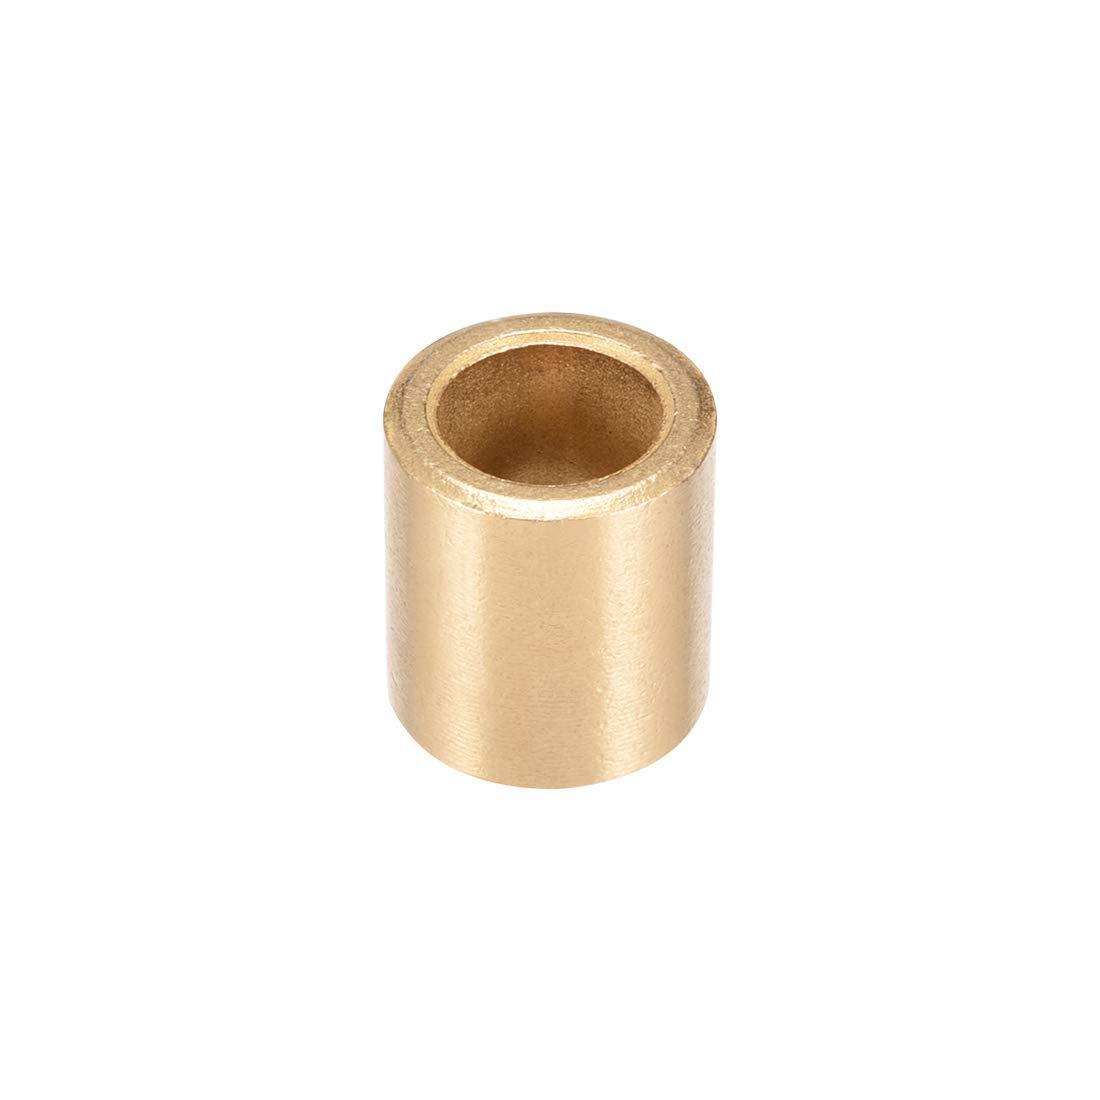 Bearing Bush 12 mm Diameter x 18 mm Outside Diameter x 10 mm Length Self-lubricating sintered Bronze bushings